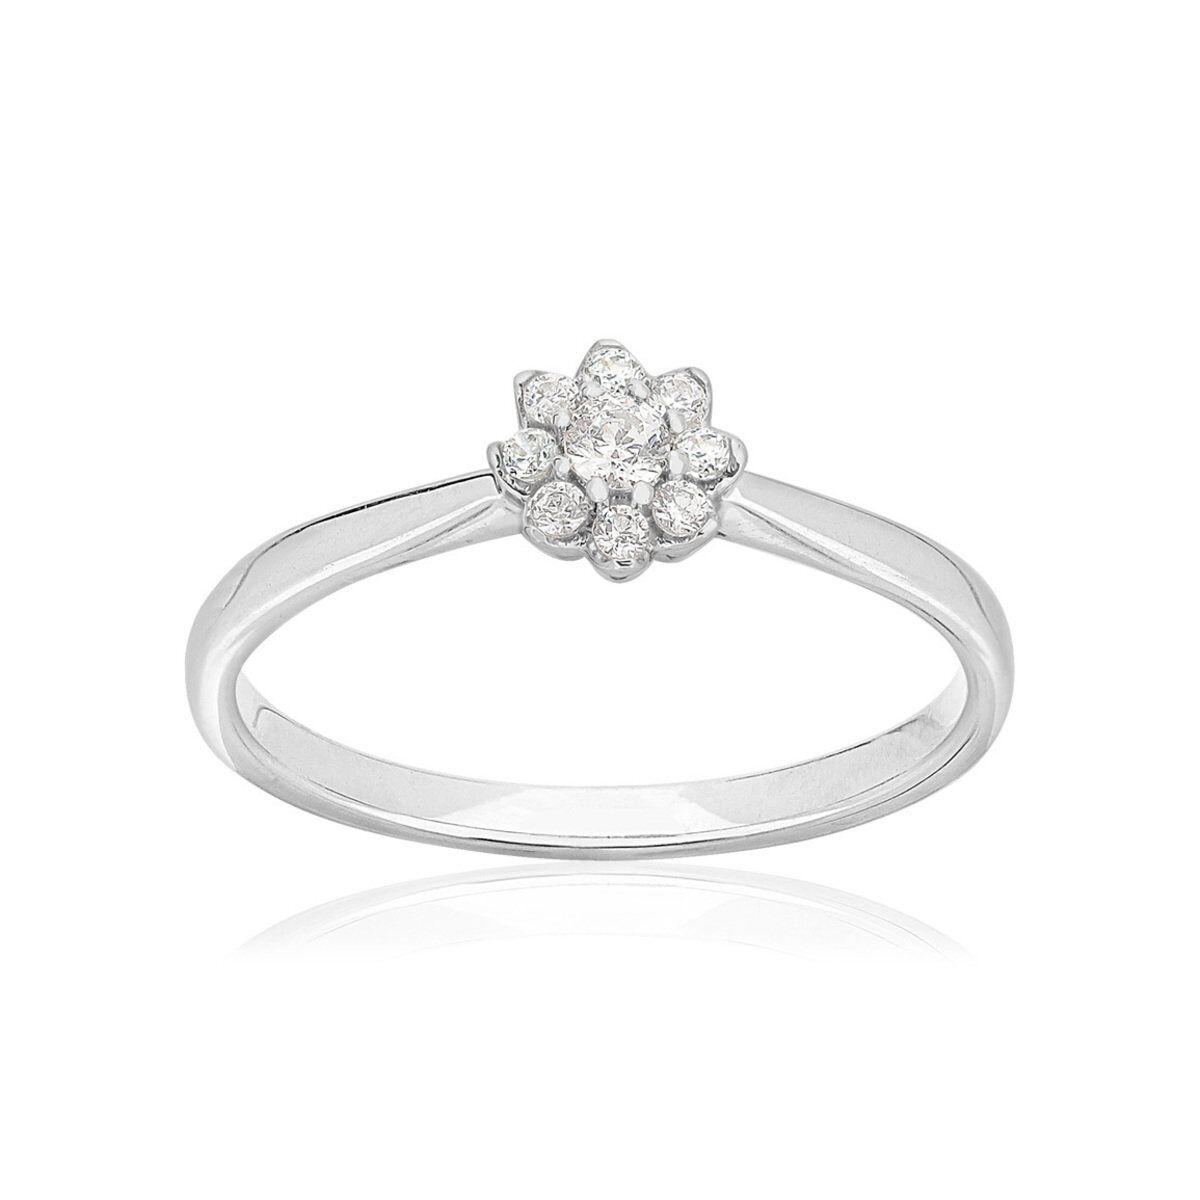 MATY Bague or 750 blanc fleur diamants synthétiques 0,15 carat- MATY